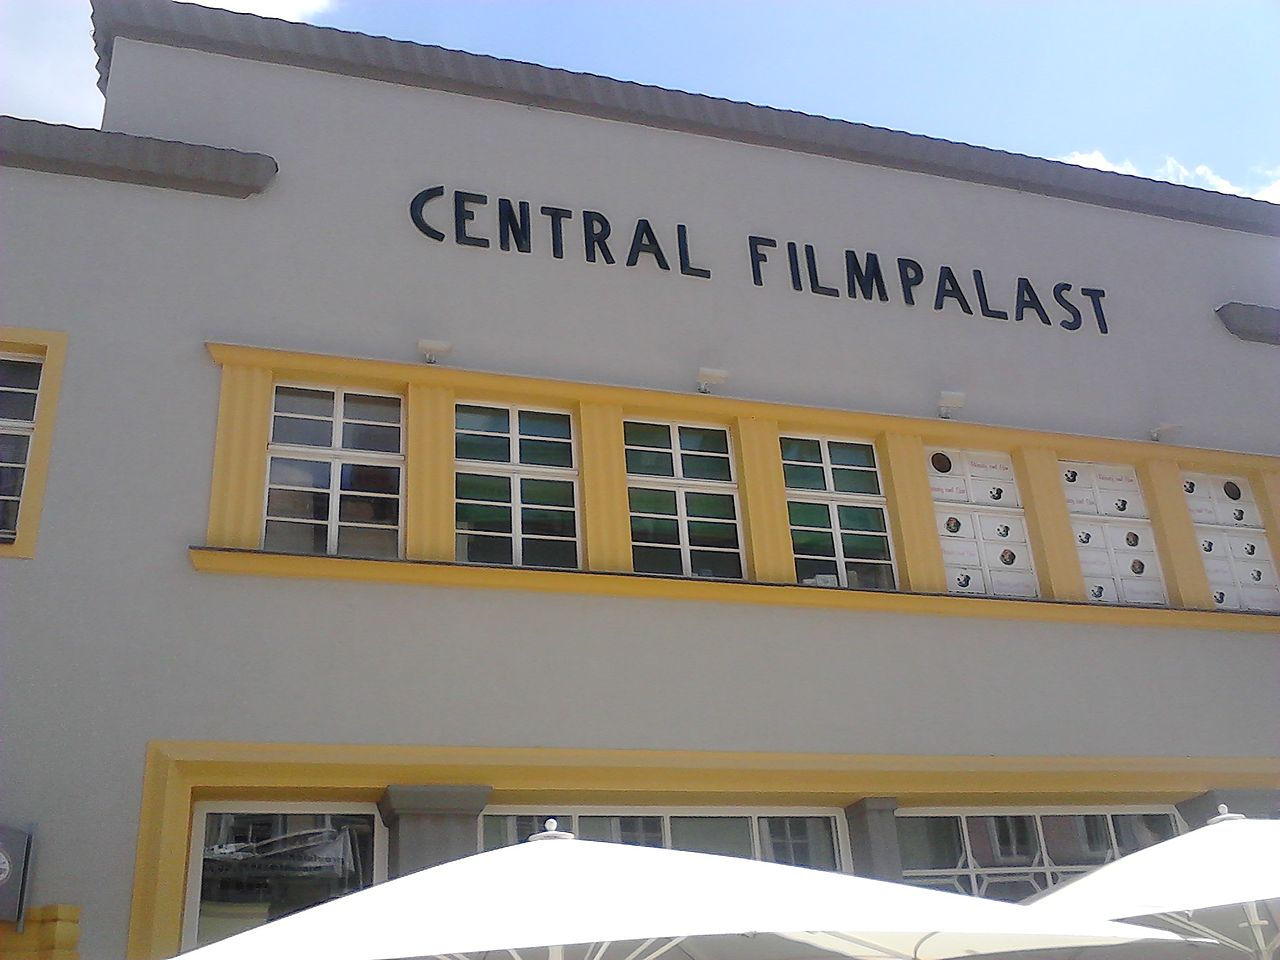 Filmpalast Mühlhausen Central